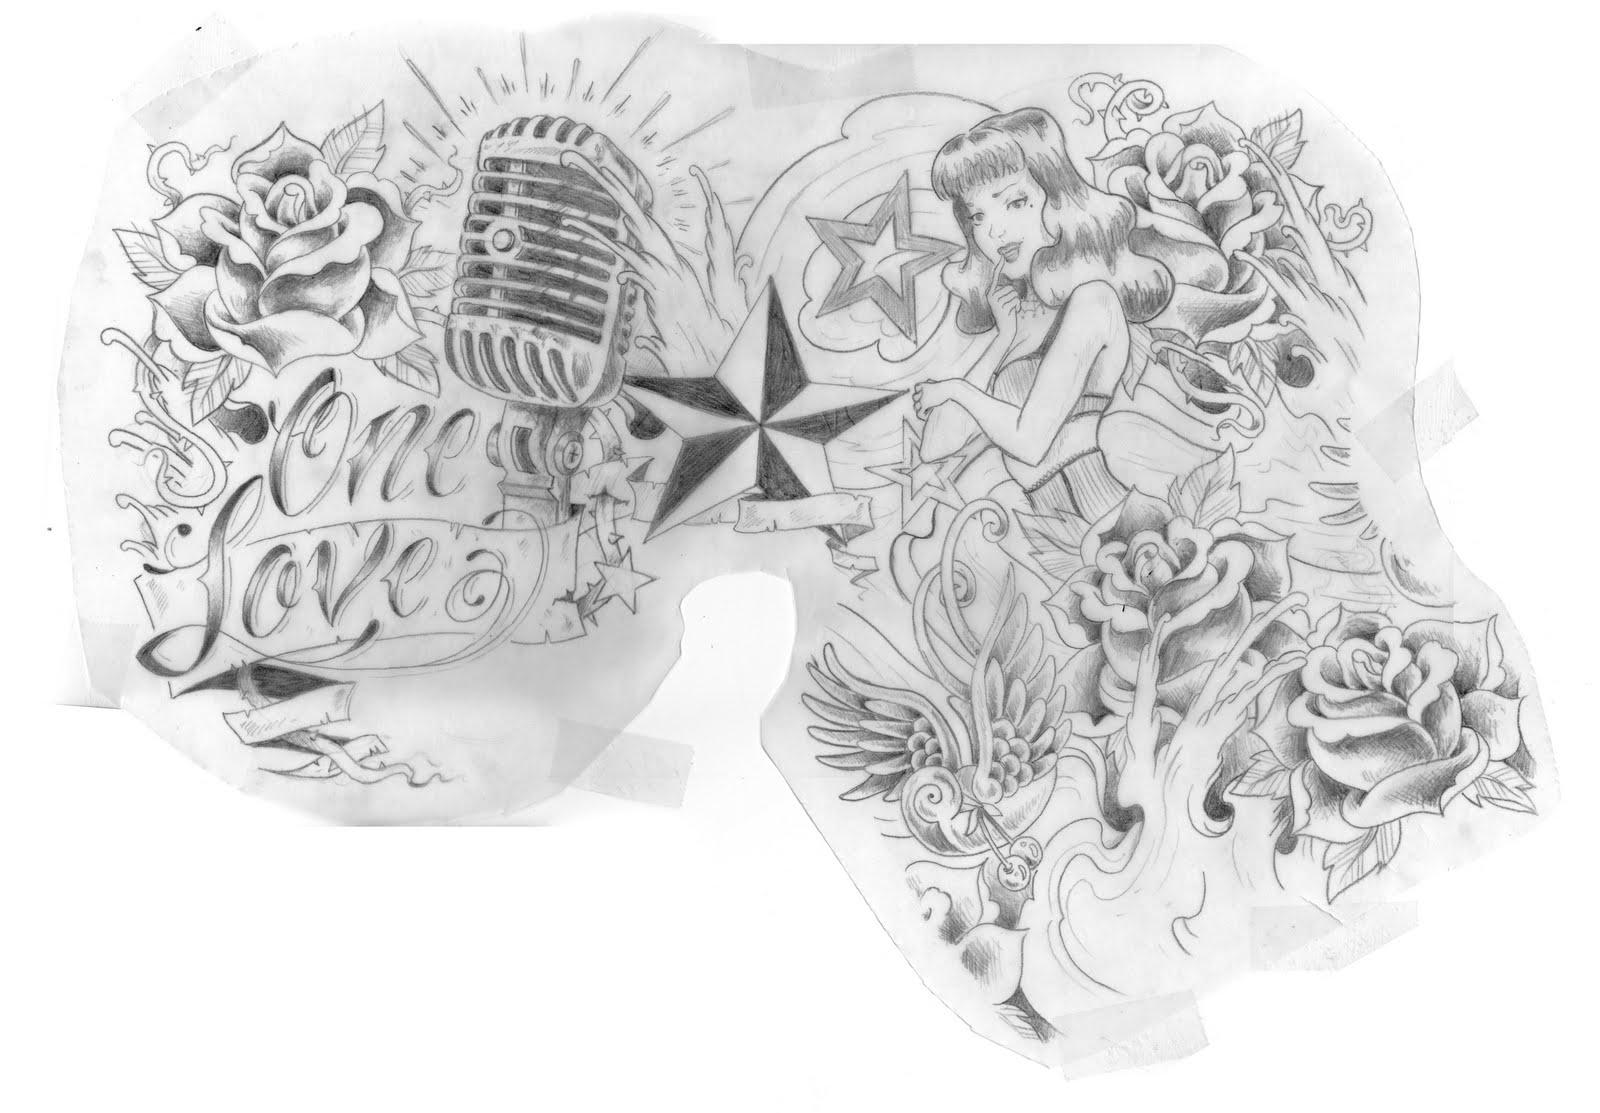 http://2.bp.blogspot.com/-Xe8X3JTpbqo/TWkz3GXmmcI/AAAAAAAAADk/g60g6jBV2XQ/s1600/tattoo+manchette.jpg